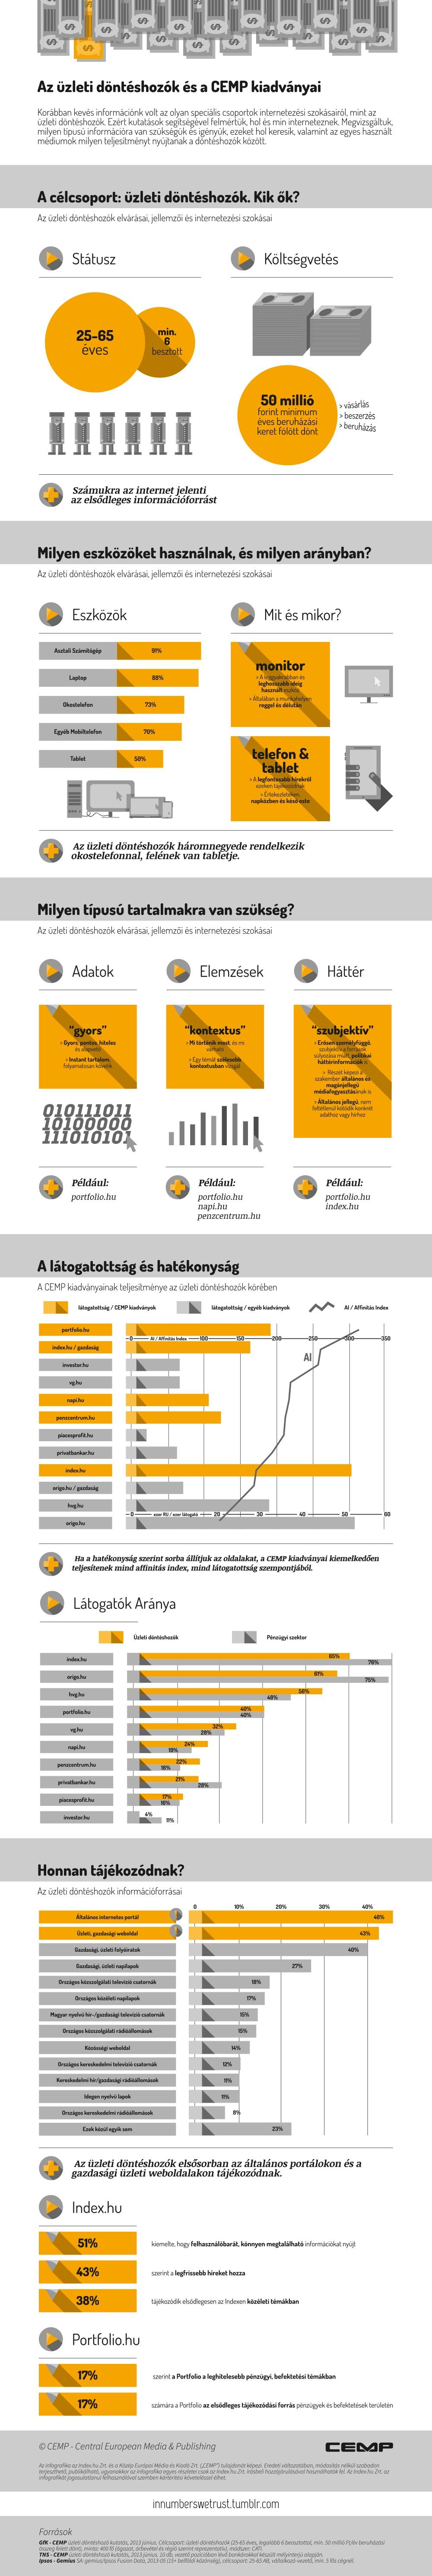 CEMPSH_uzleti_donteshozok_tajekozodasa_infografika.jpg